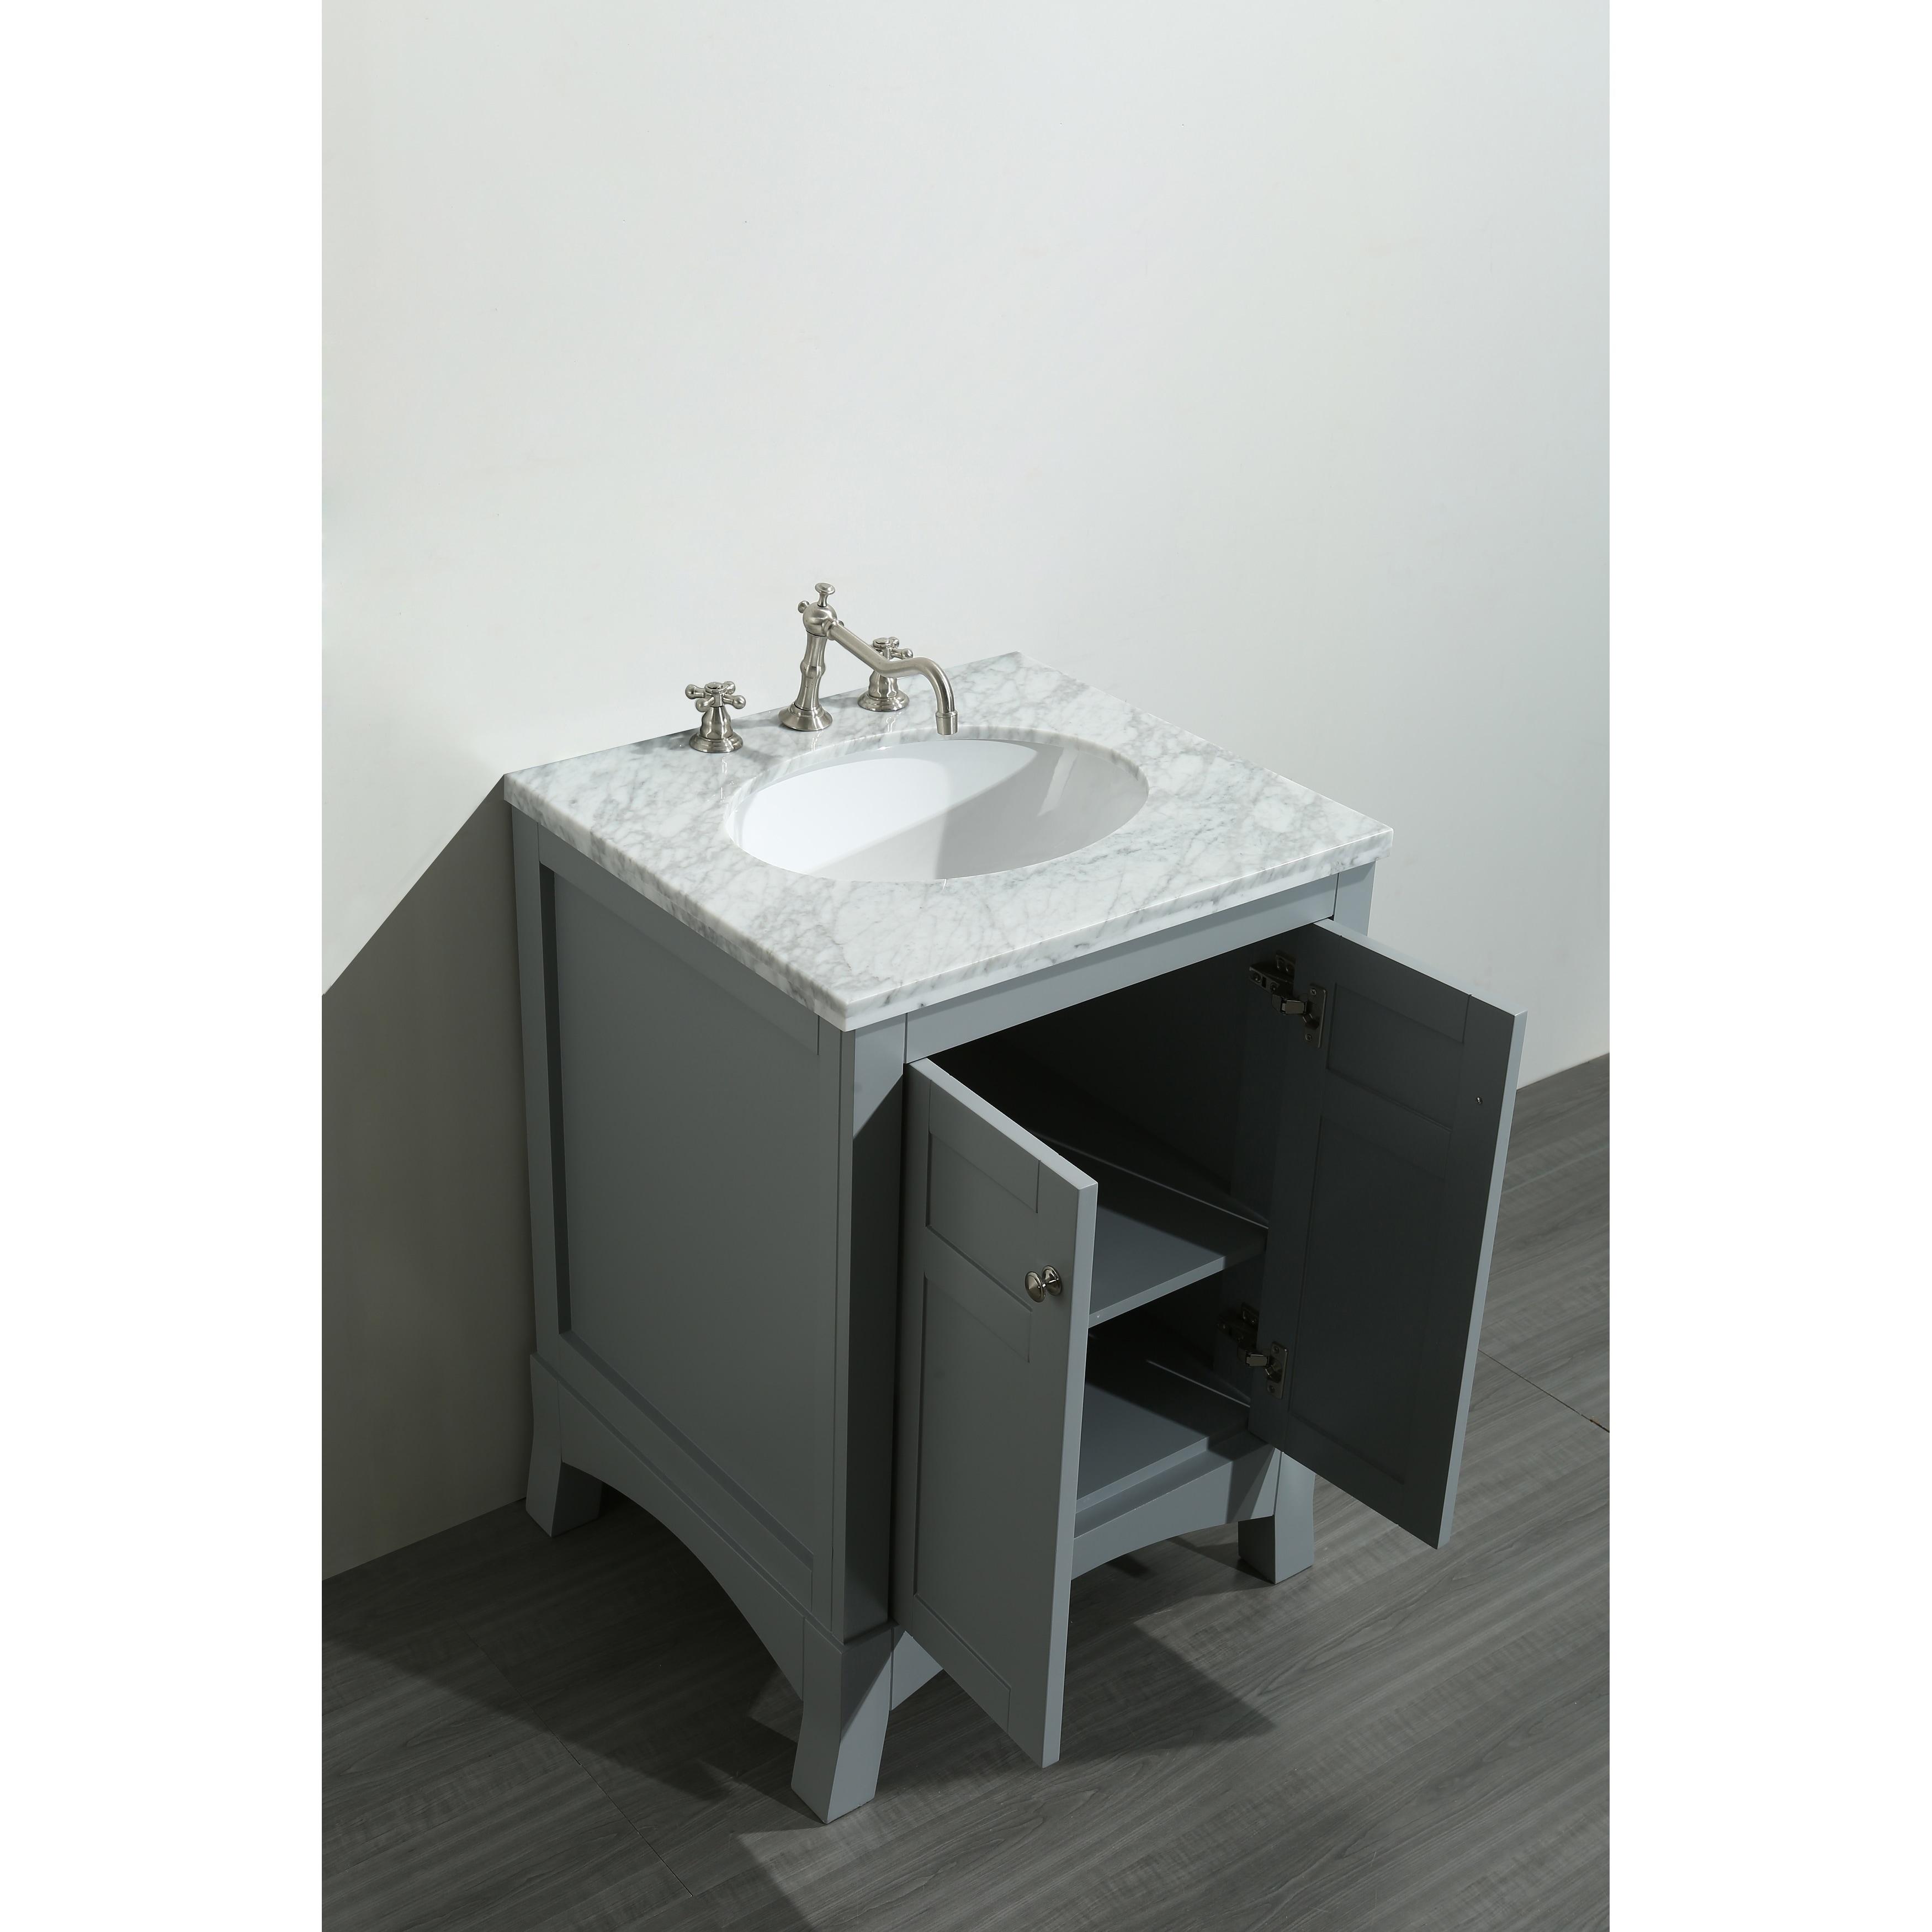 Shop Eviva New York 24 Inch Grey Bathroom Vanity With White Marble